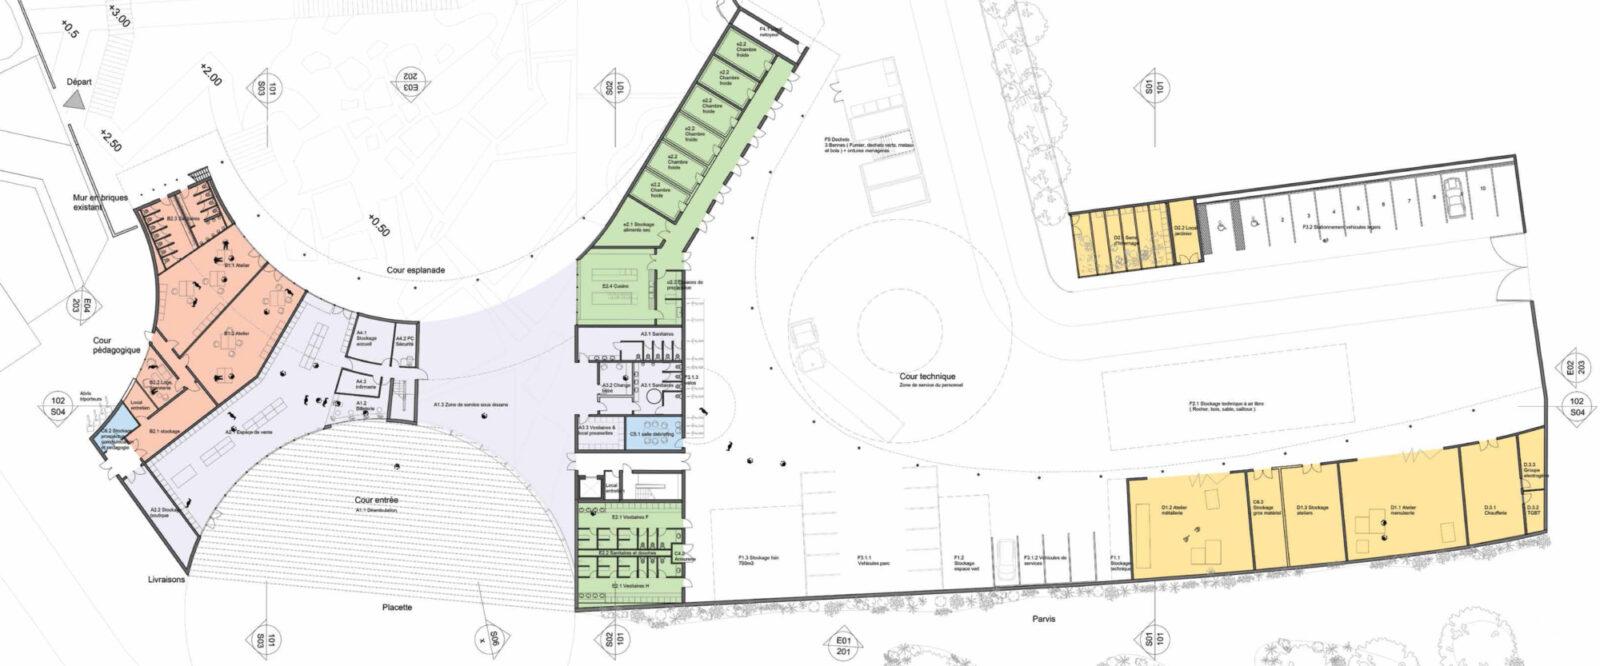 Ground Floor Plan of New Entrance